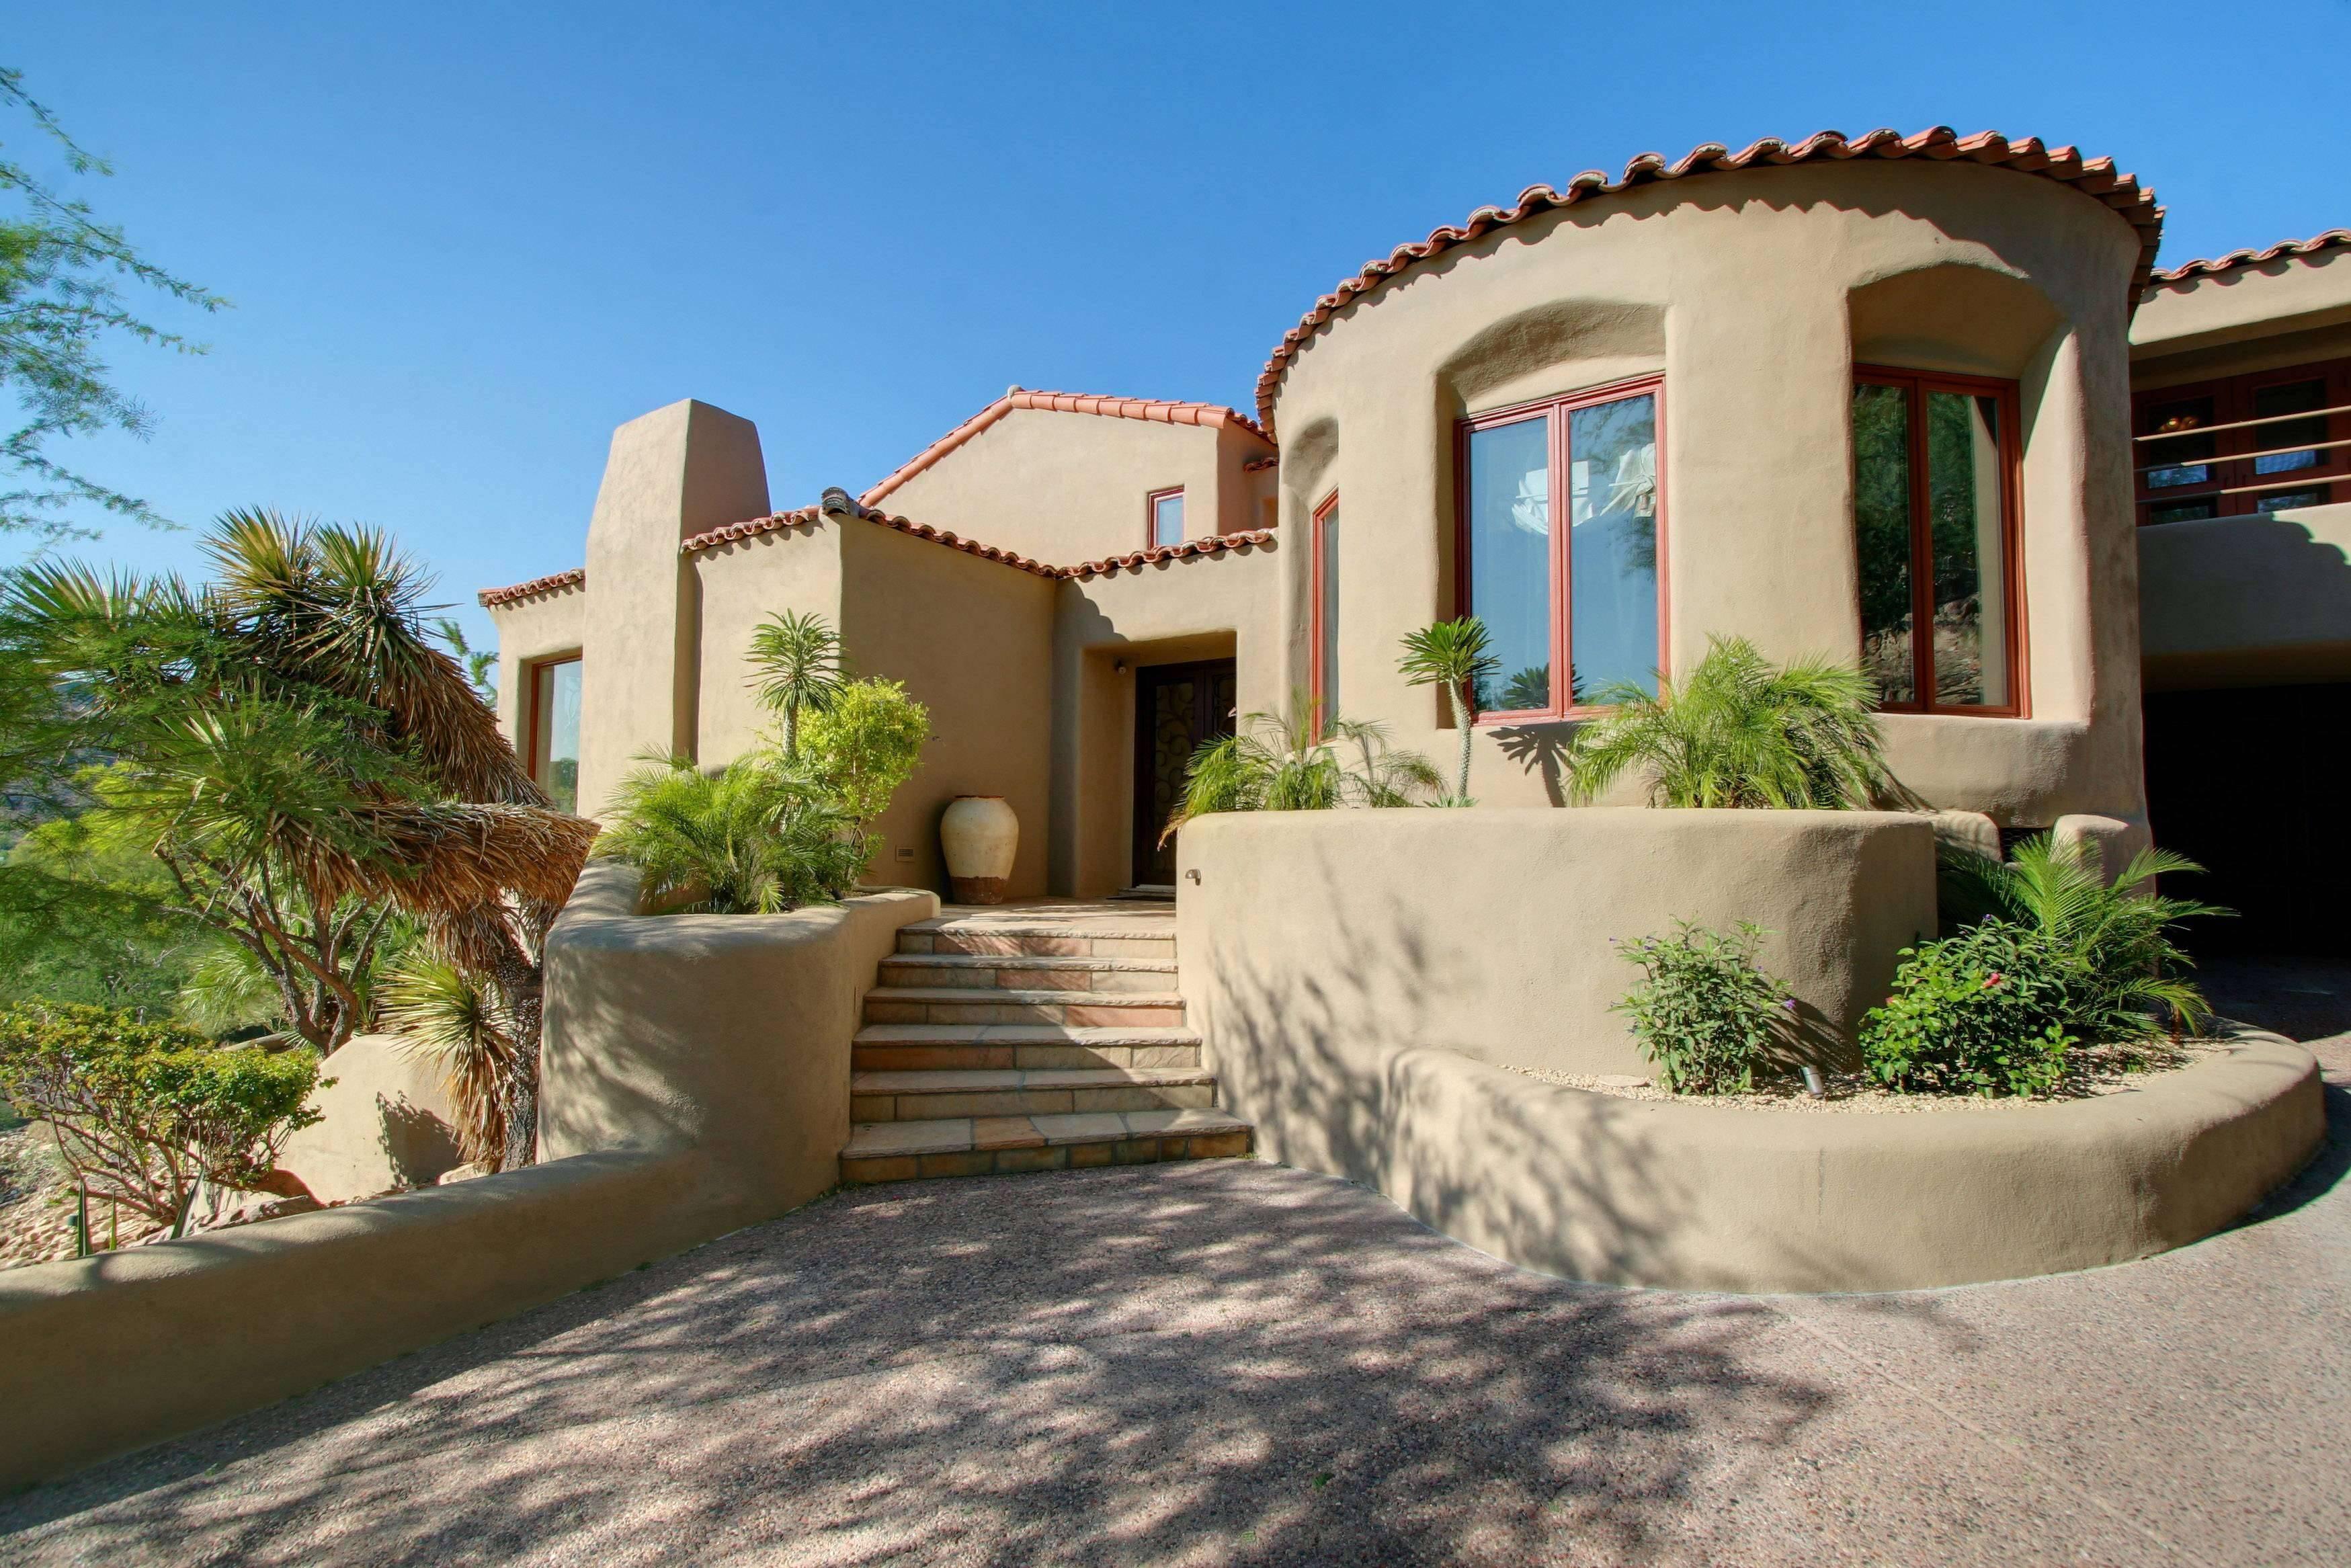 house for sale paradise valley arizona united states paradise valley estate near scottsdale